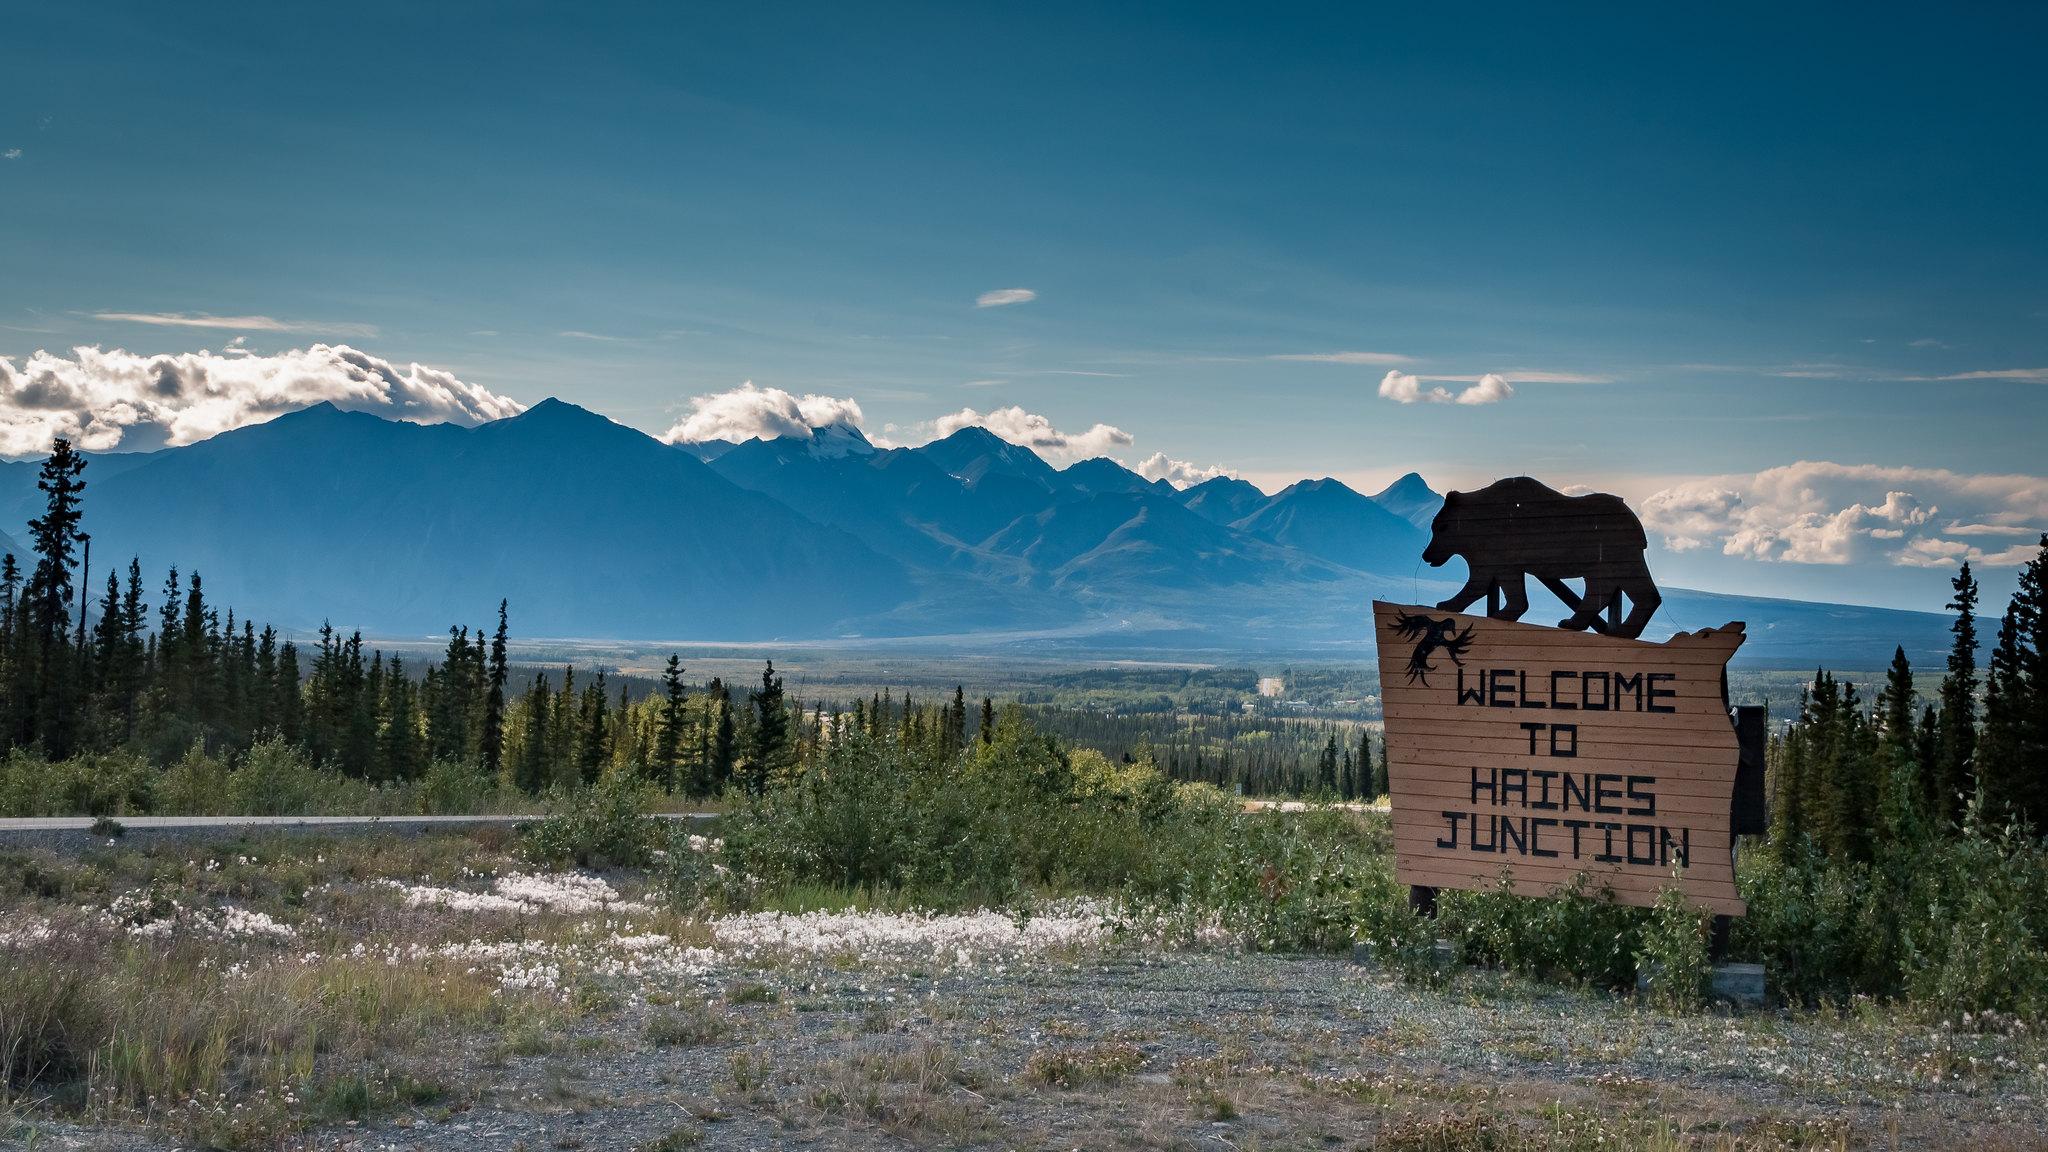 Haines Junction - Yukon - [Canada]